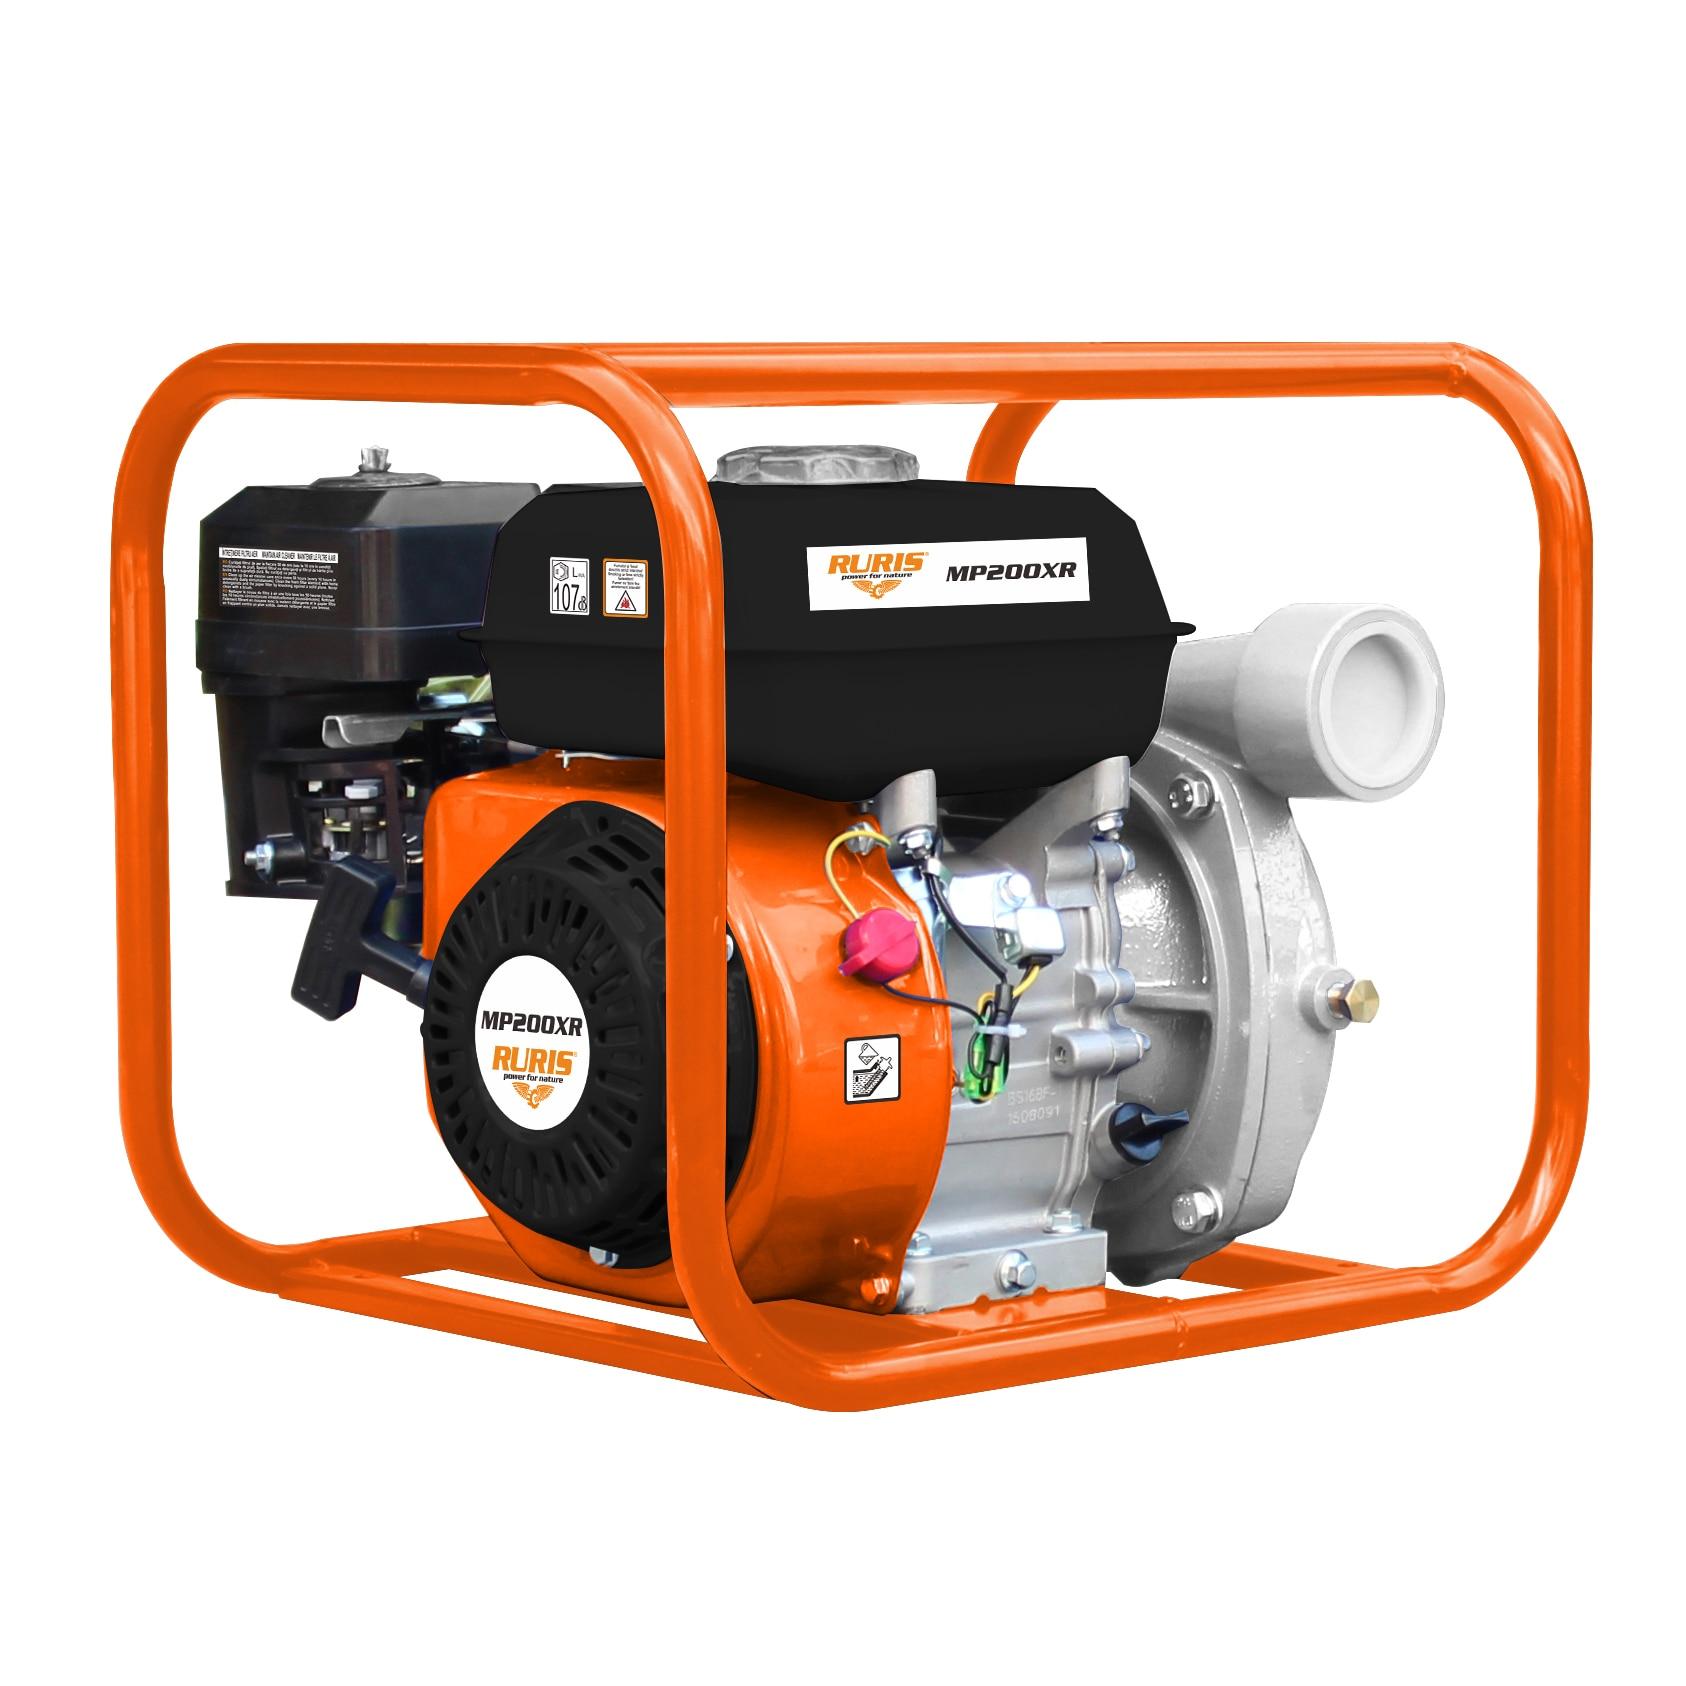 "Fotografie Motopompa RURIS MP200XR, 6.5 CP, 196 CC, 4 timpi, 2"" prindere furtun, 30 m3/h debit maxim, 8 m adancime absorbtie, 65 m refulare verticala, 650 m refulare orizontala, 3.6 l benzina"